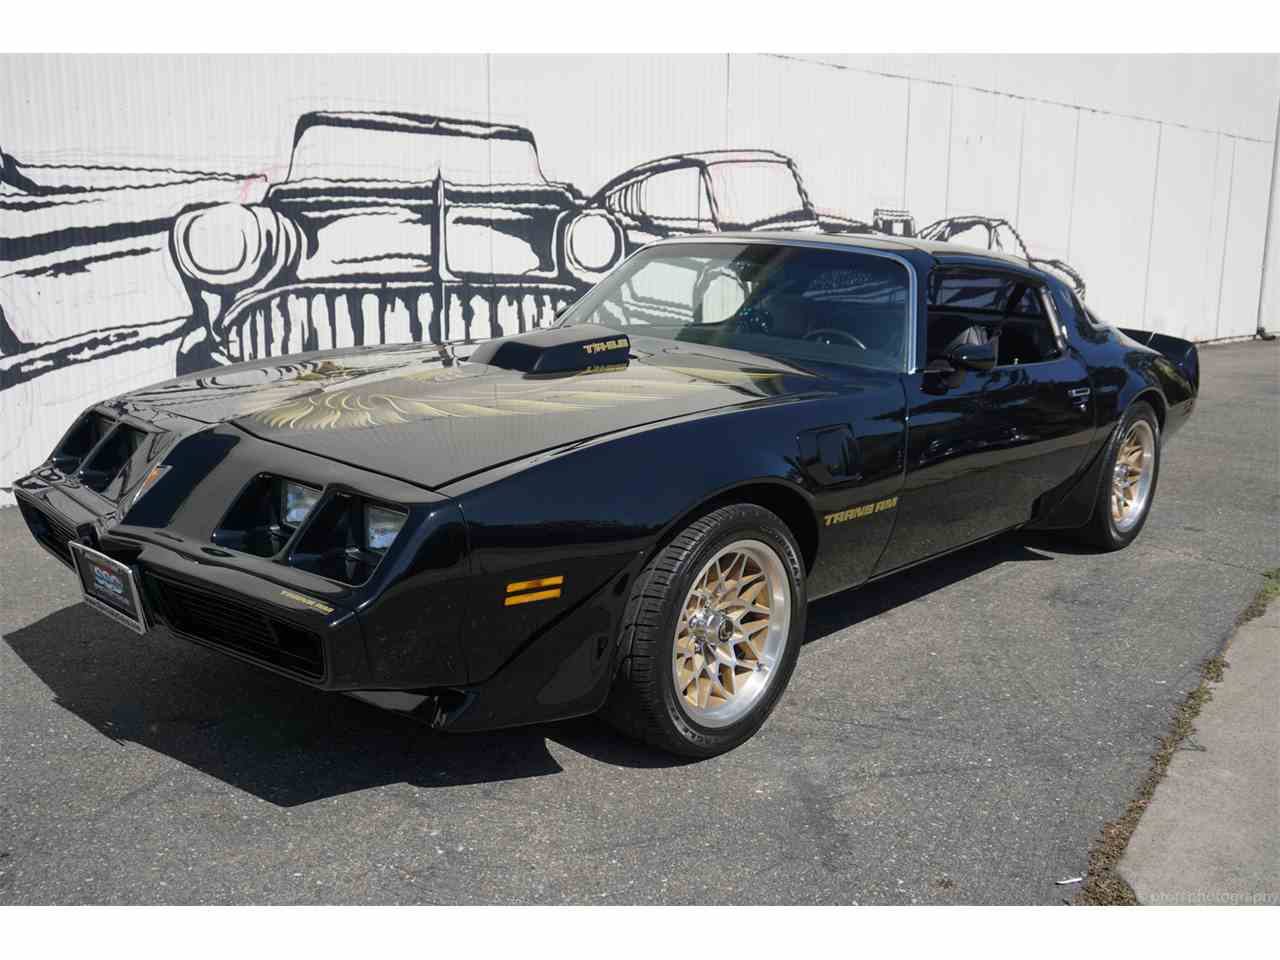 Large Picture of '79 Pontiac Firebird located in Fairfield California - $34,990.00 - KQ8J